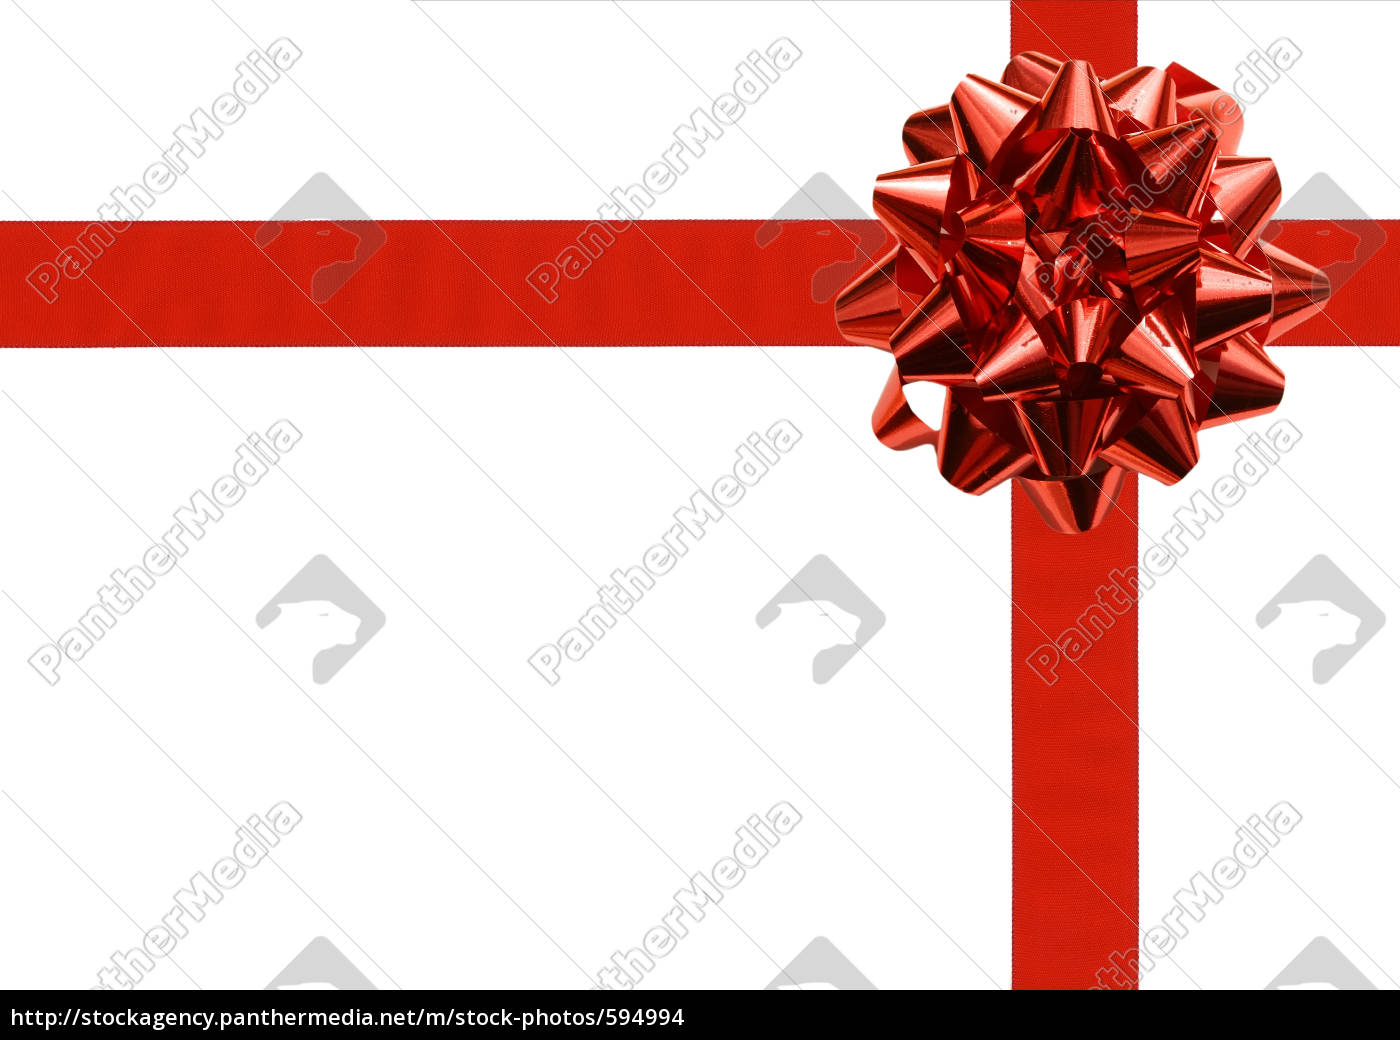 geschenkband - 594994